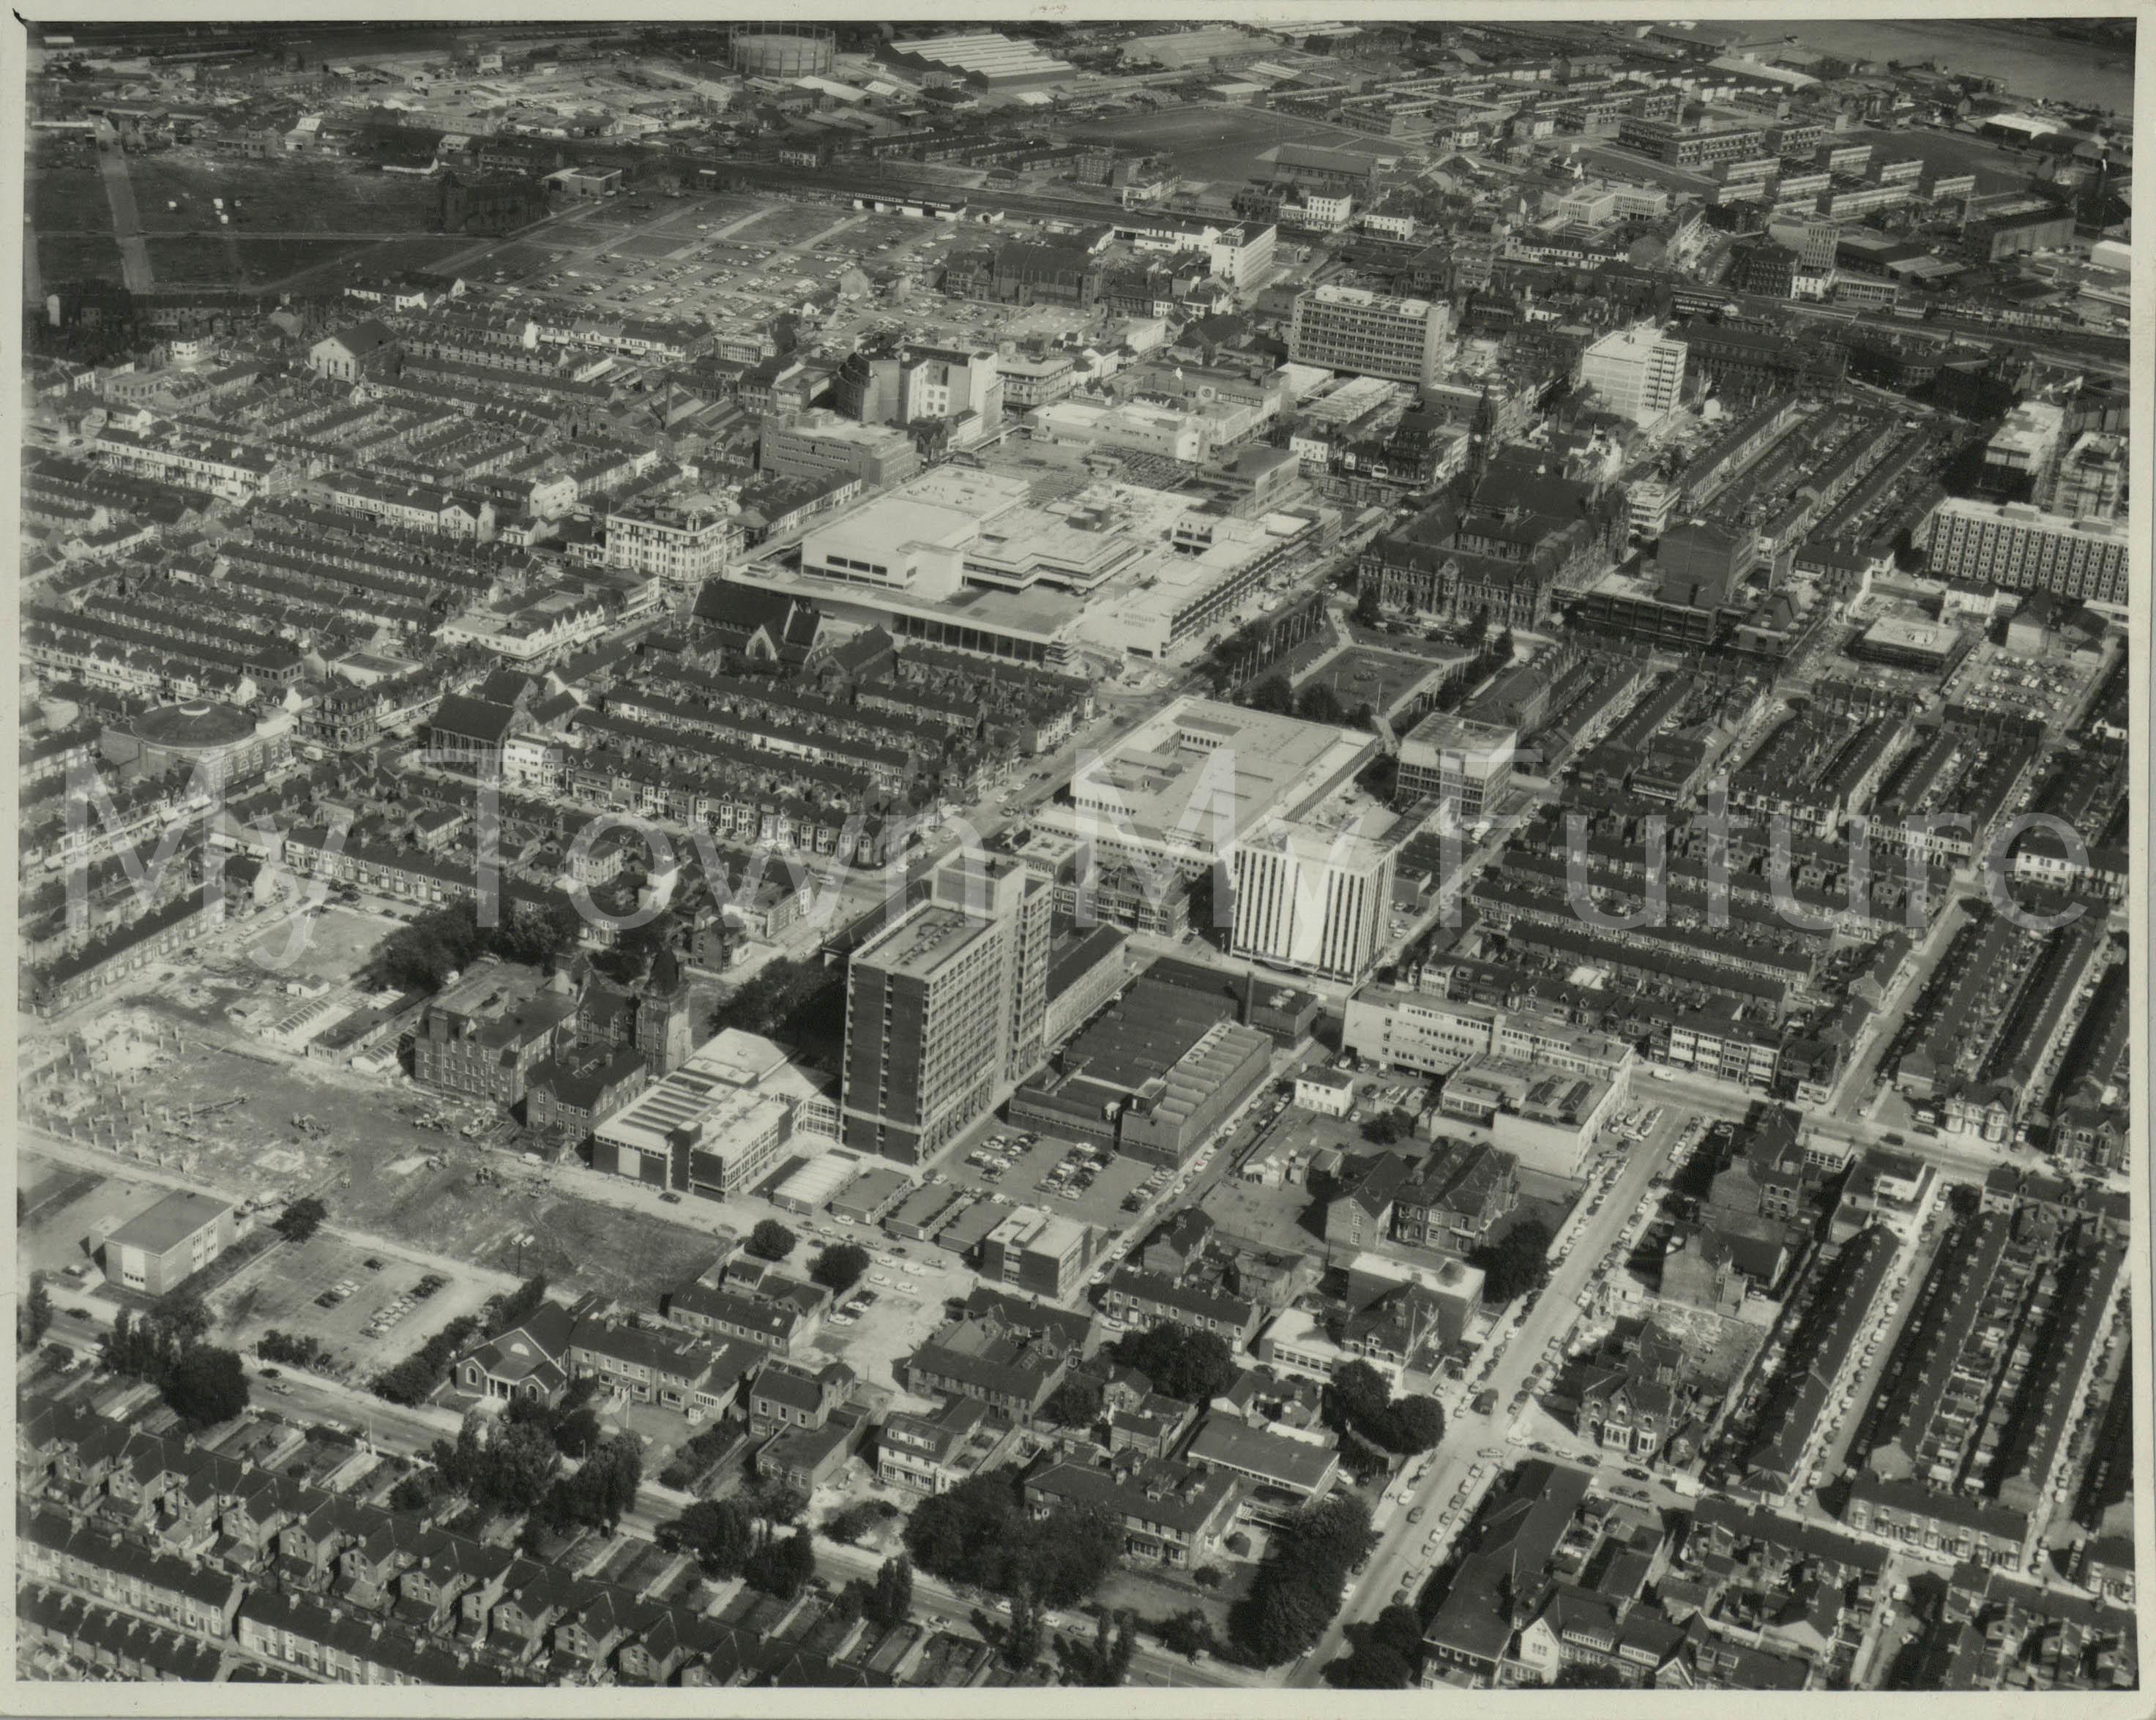 Middlesbrough Town Centre, 1972, Aerofilms